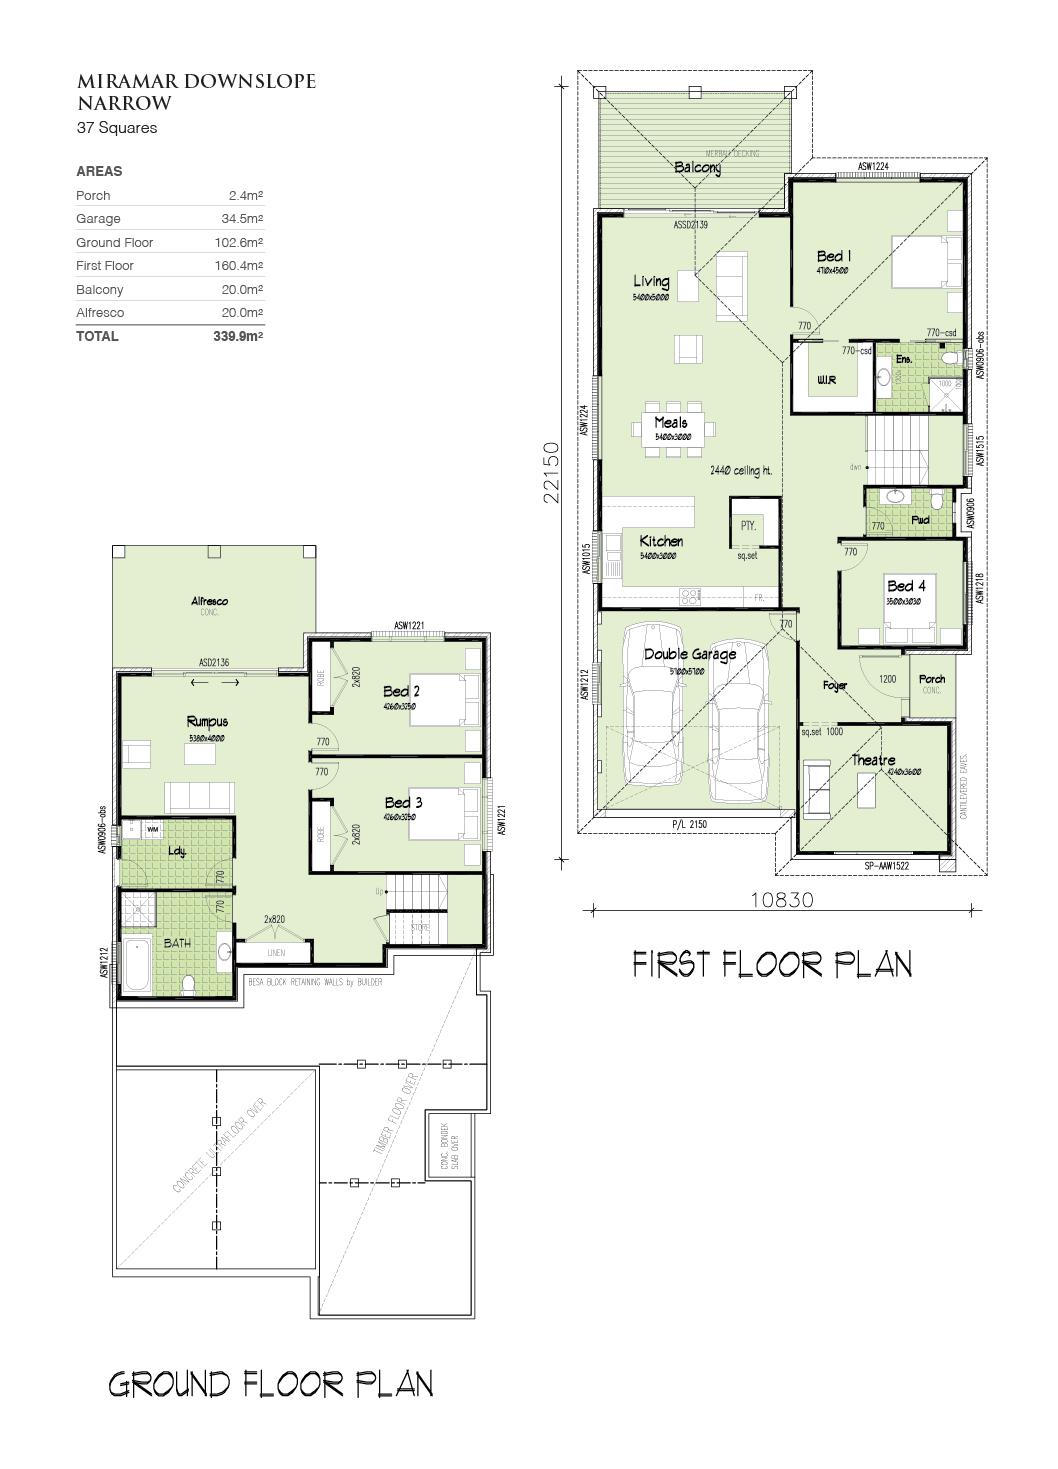 Miramar Downslope Narrow, Home Design, Tullipan Homes